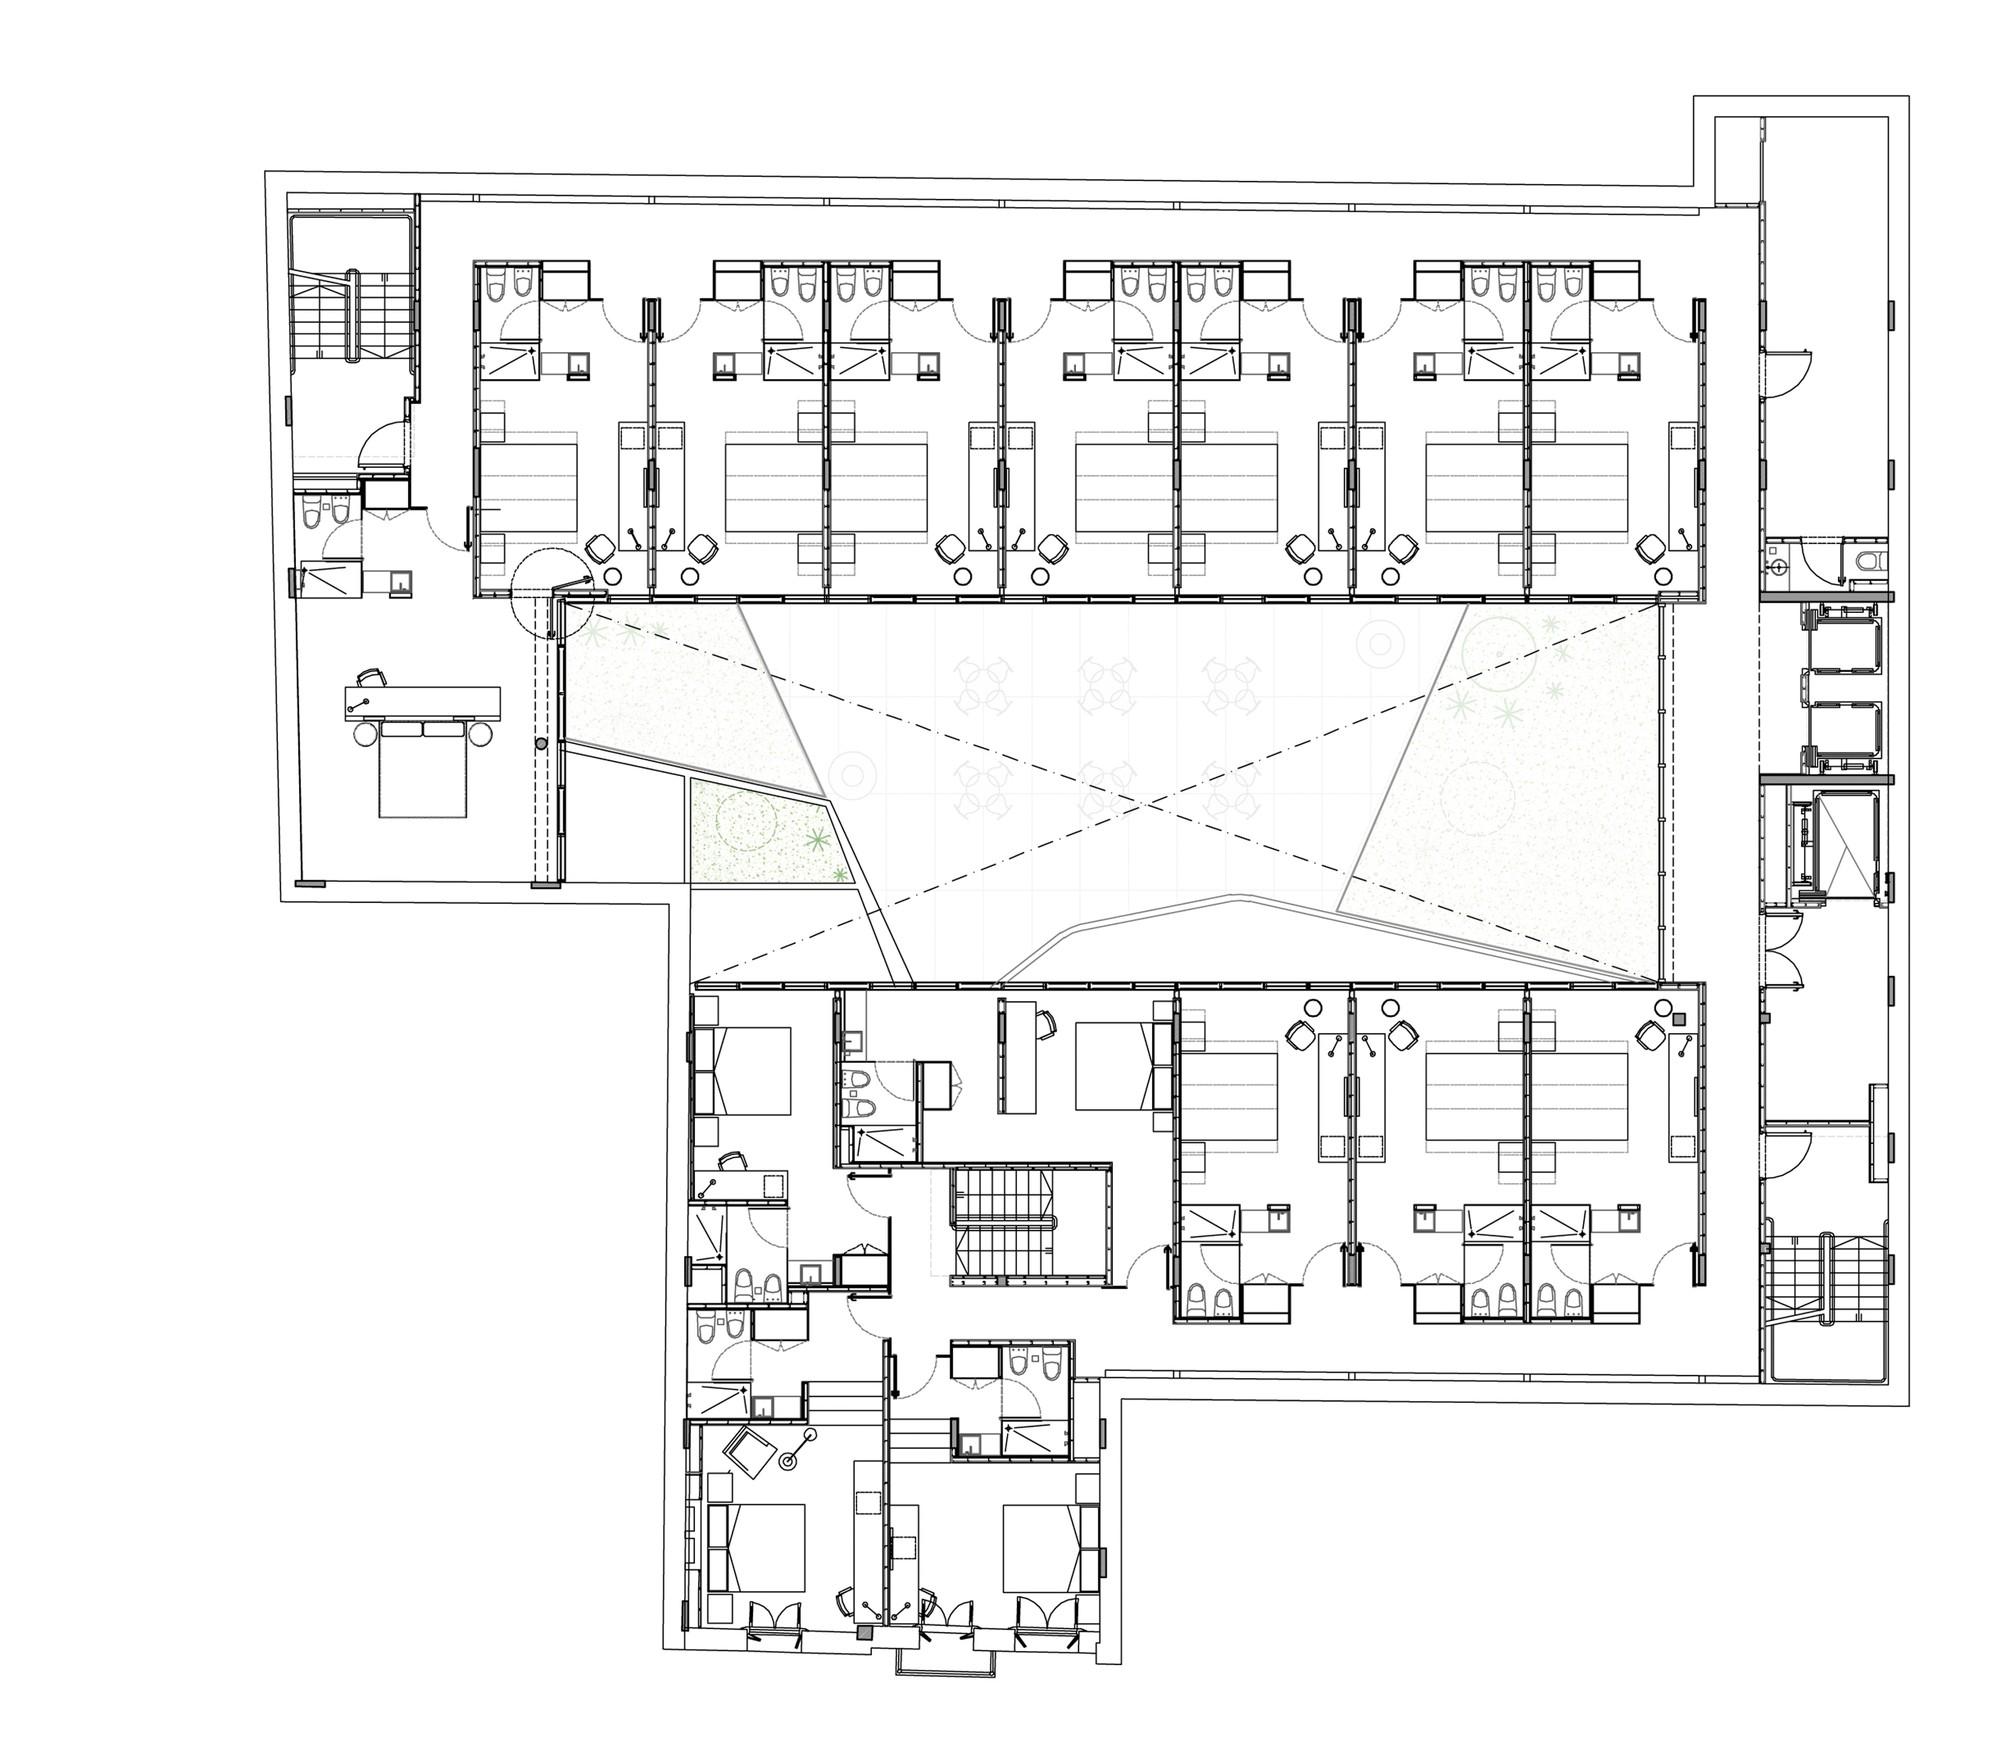 Gallery of hotel me san telmo estudio rietti smud 13 for Plan estudios arquitectura